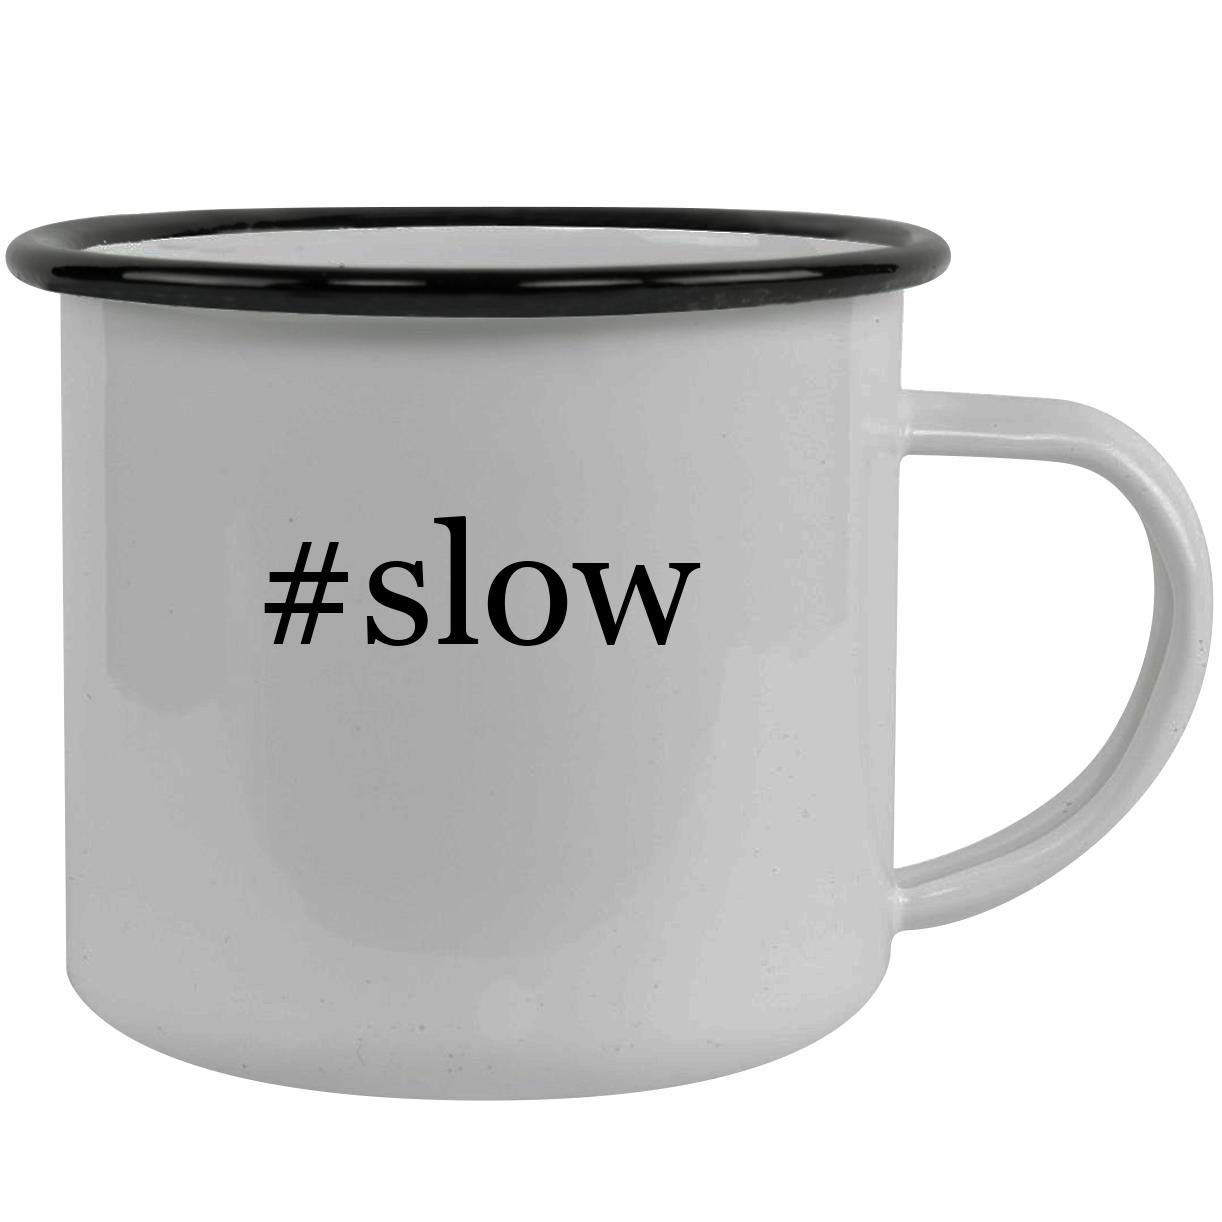 #slow - Stainless Steel Hashtag 12oz Camping Mug, Black